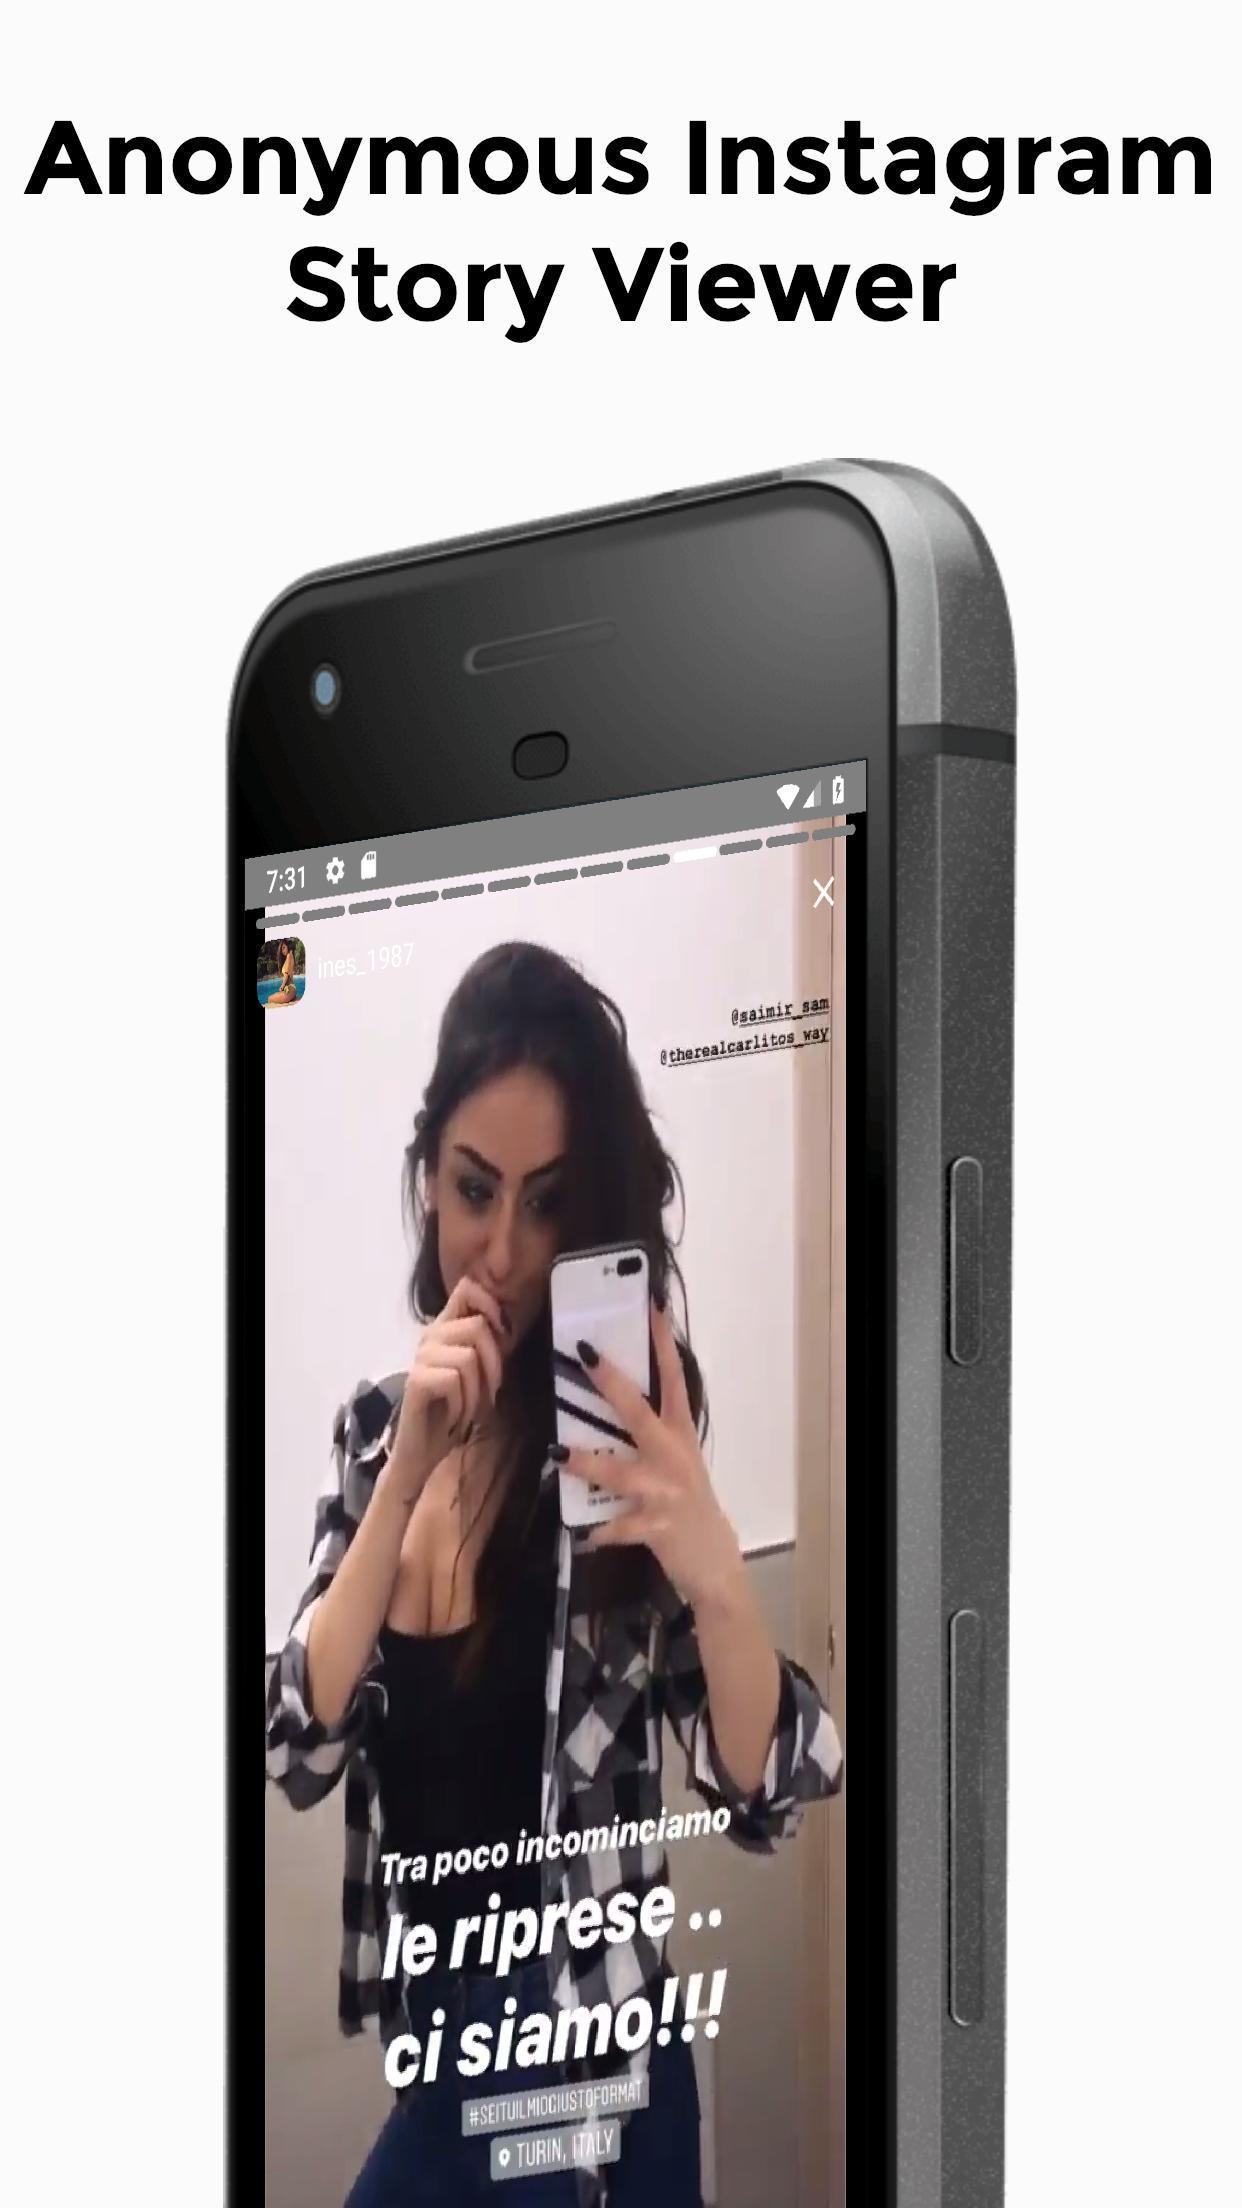 Story Stalker for Android - APK Download